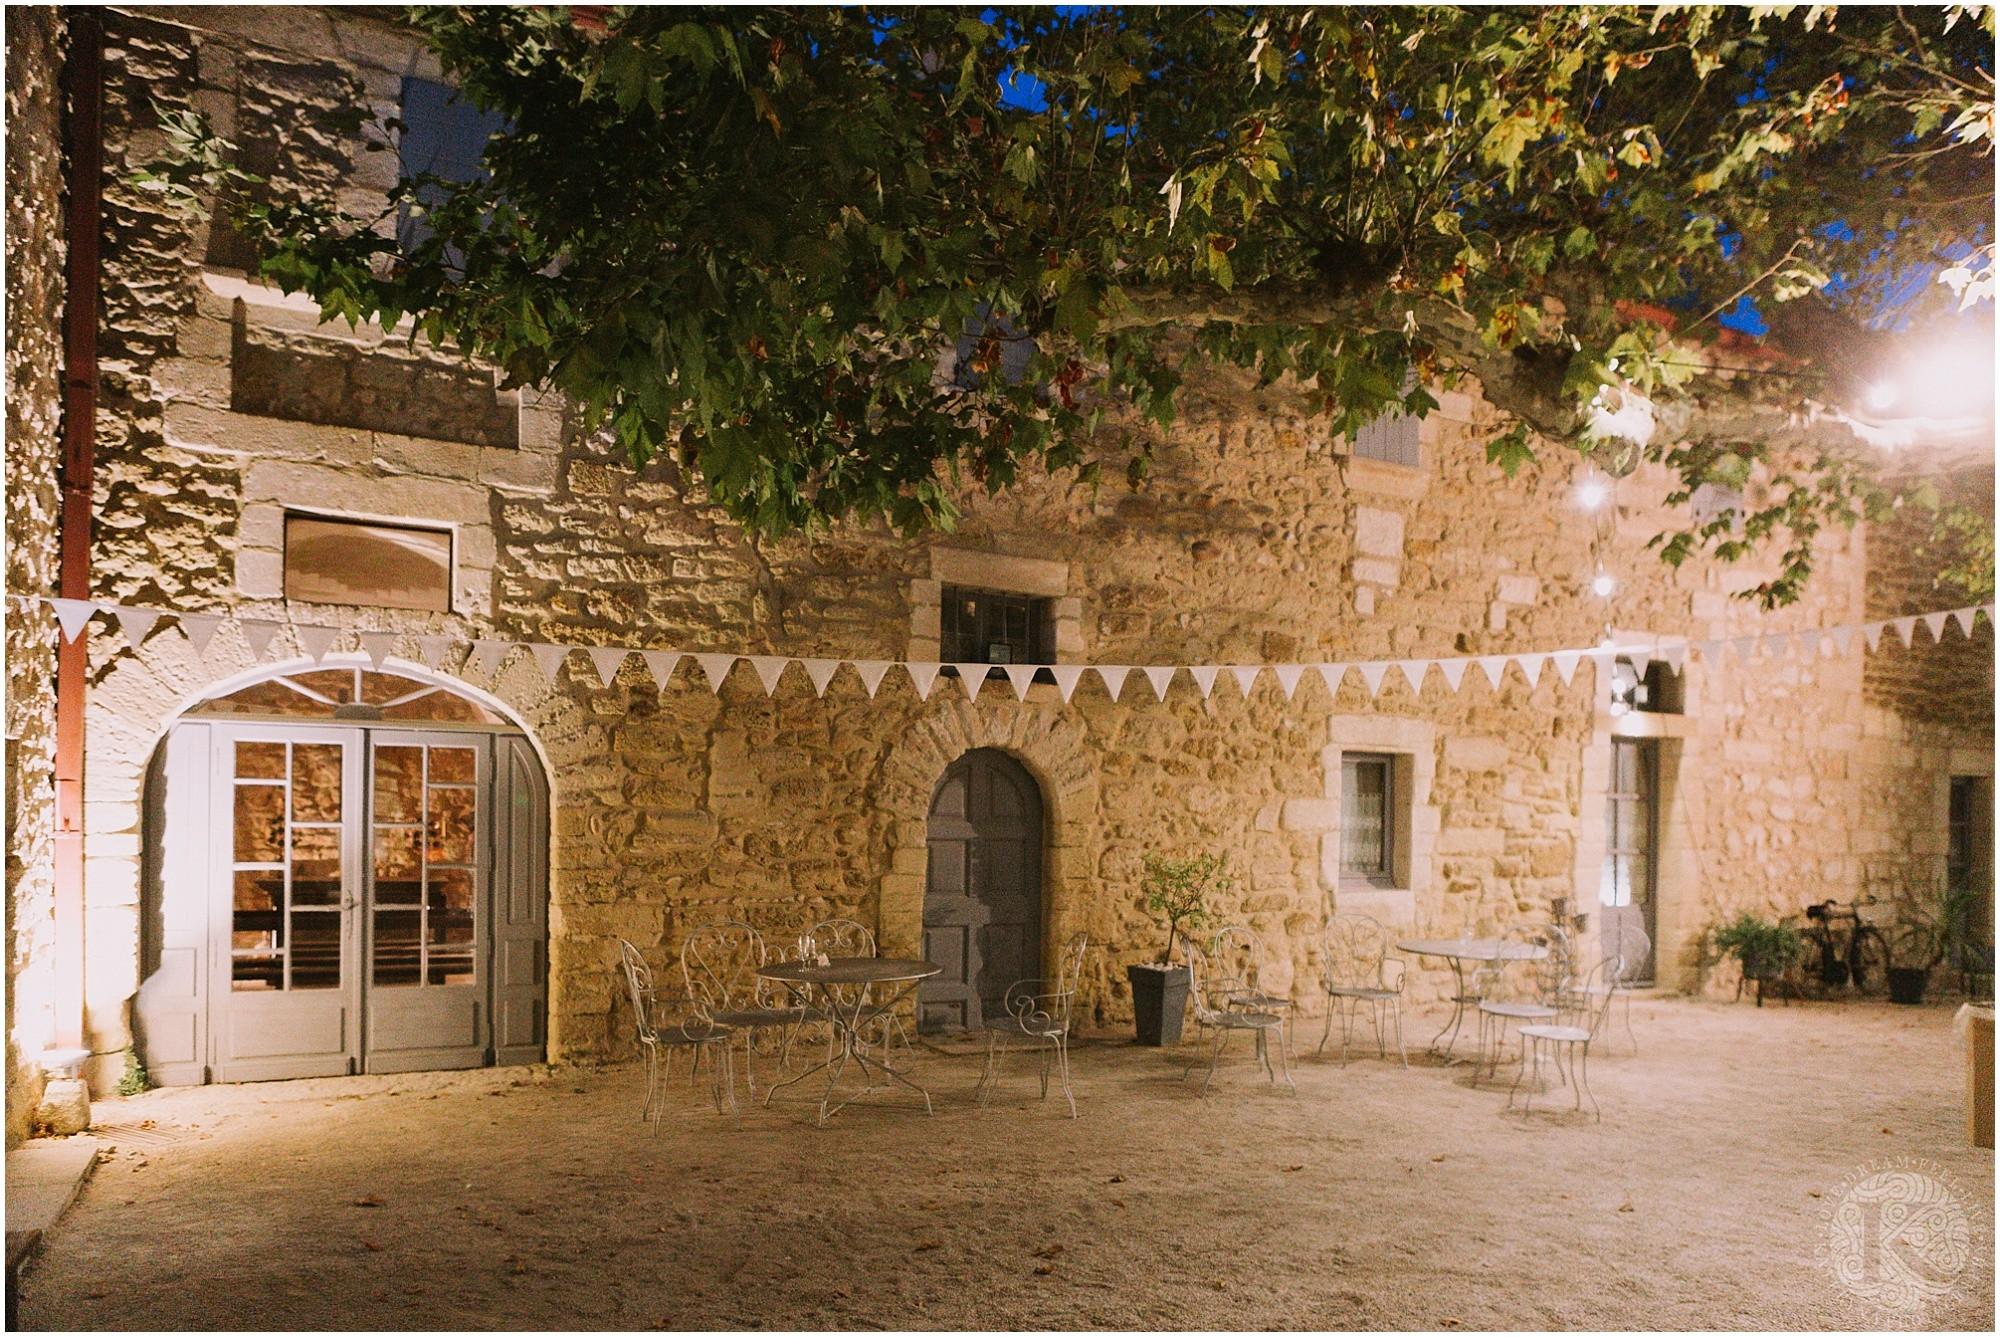 Kateryna-photos-photographe-mariage-vaucluse-provence-avignon-ferme-st-hugues_0090.jpg